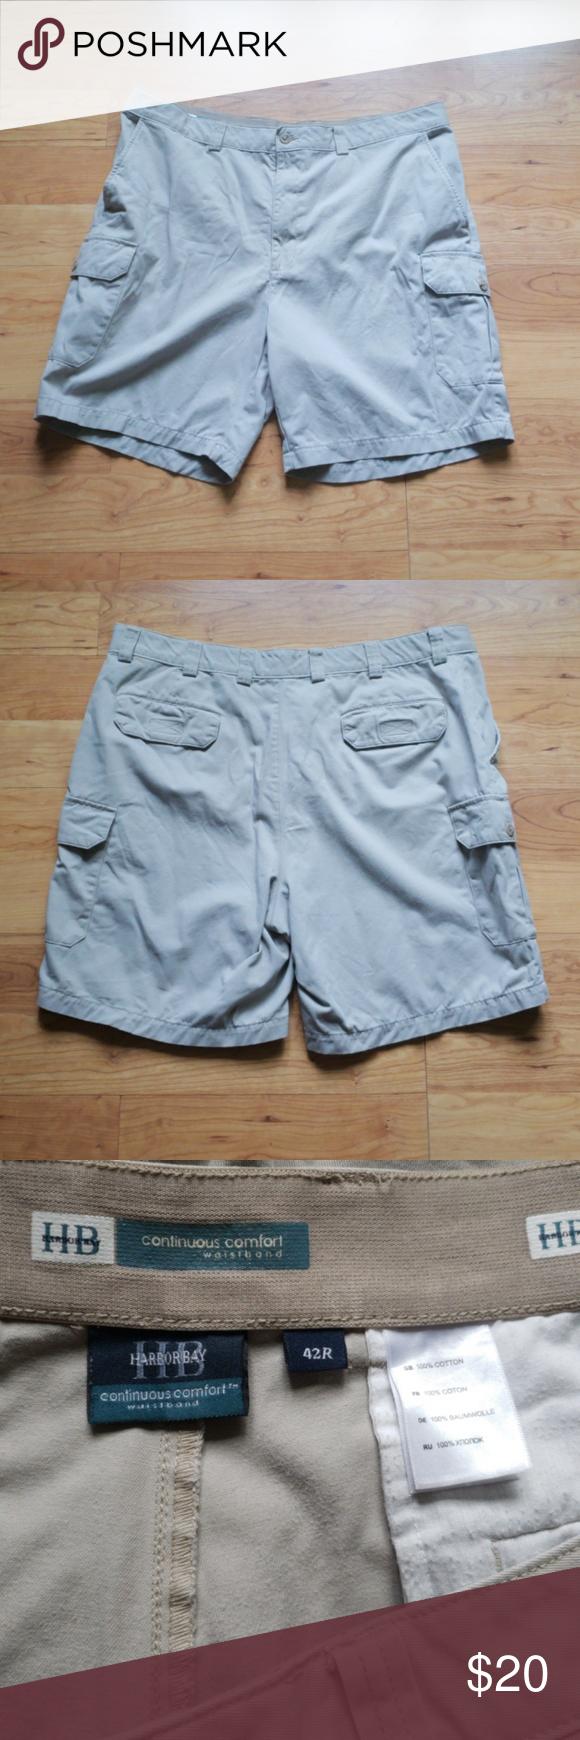 083c270ff8 Harbor Bay cargo shorts Continuous comfort waistband harbor bay Shorts Cargo